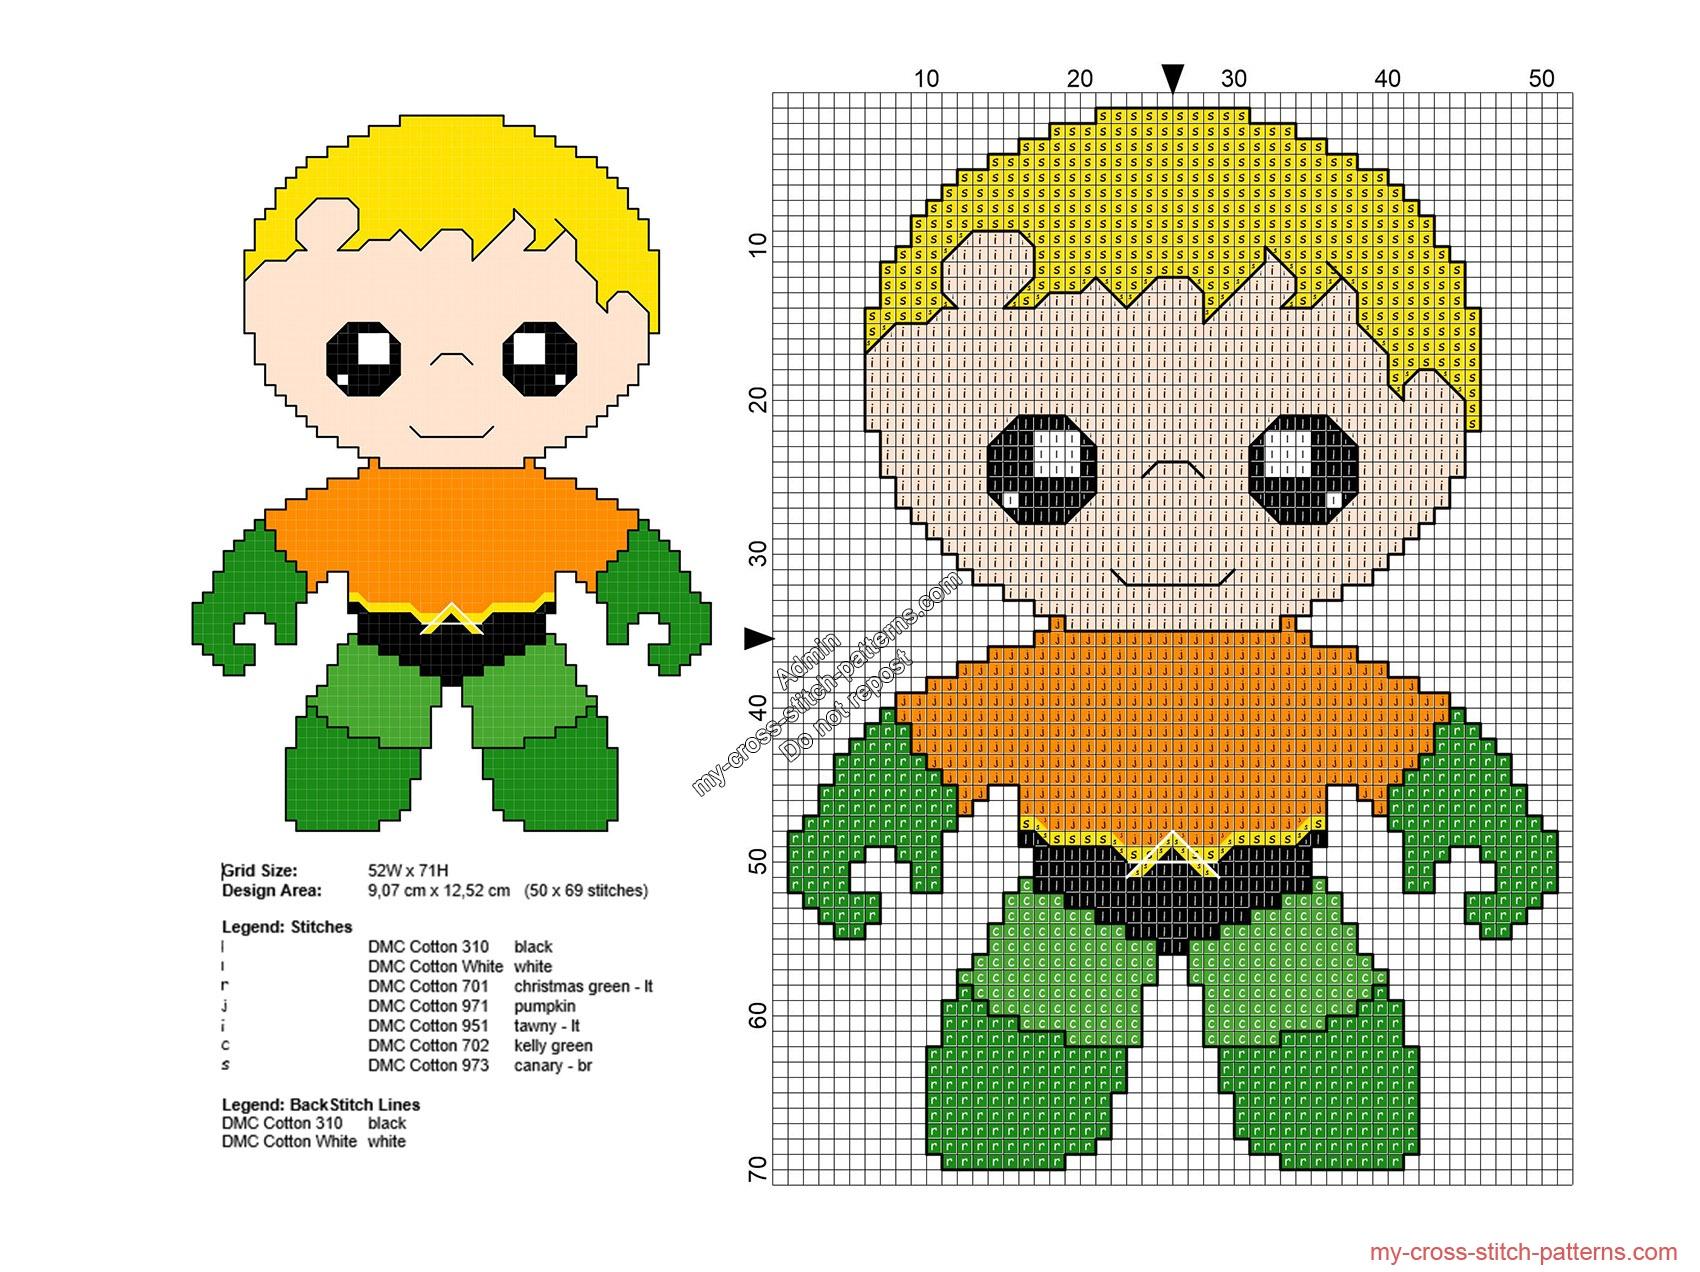 baby_aquaman_free_superheroes_cross_stitch_patterns_50x69